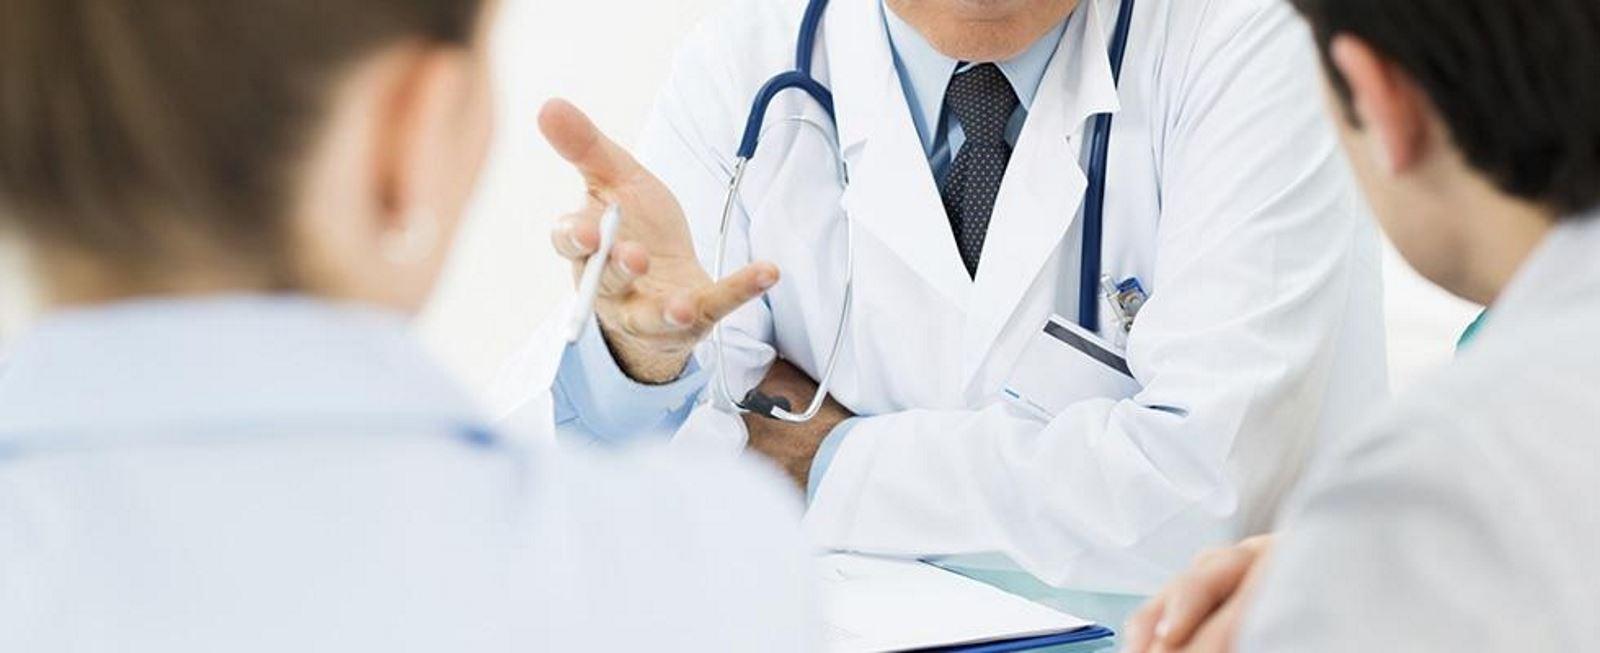 tre medici mentre parlano seduti al tavolo